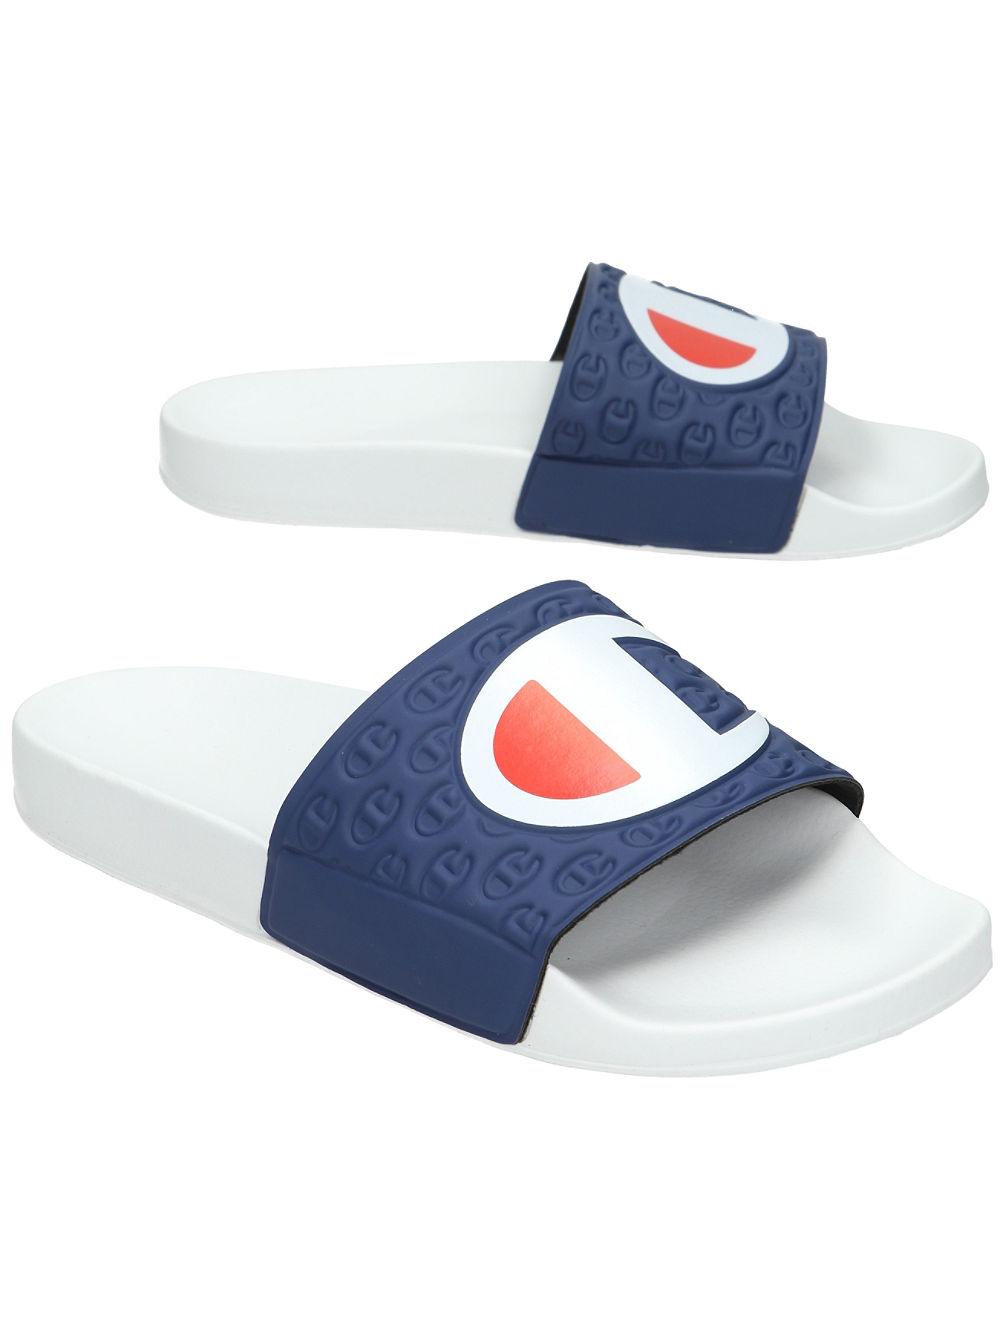 9043fe91115f7 Buy Champion Pool Slides online at Blue Tomato